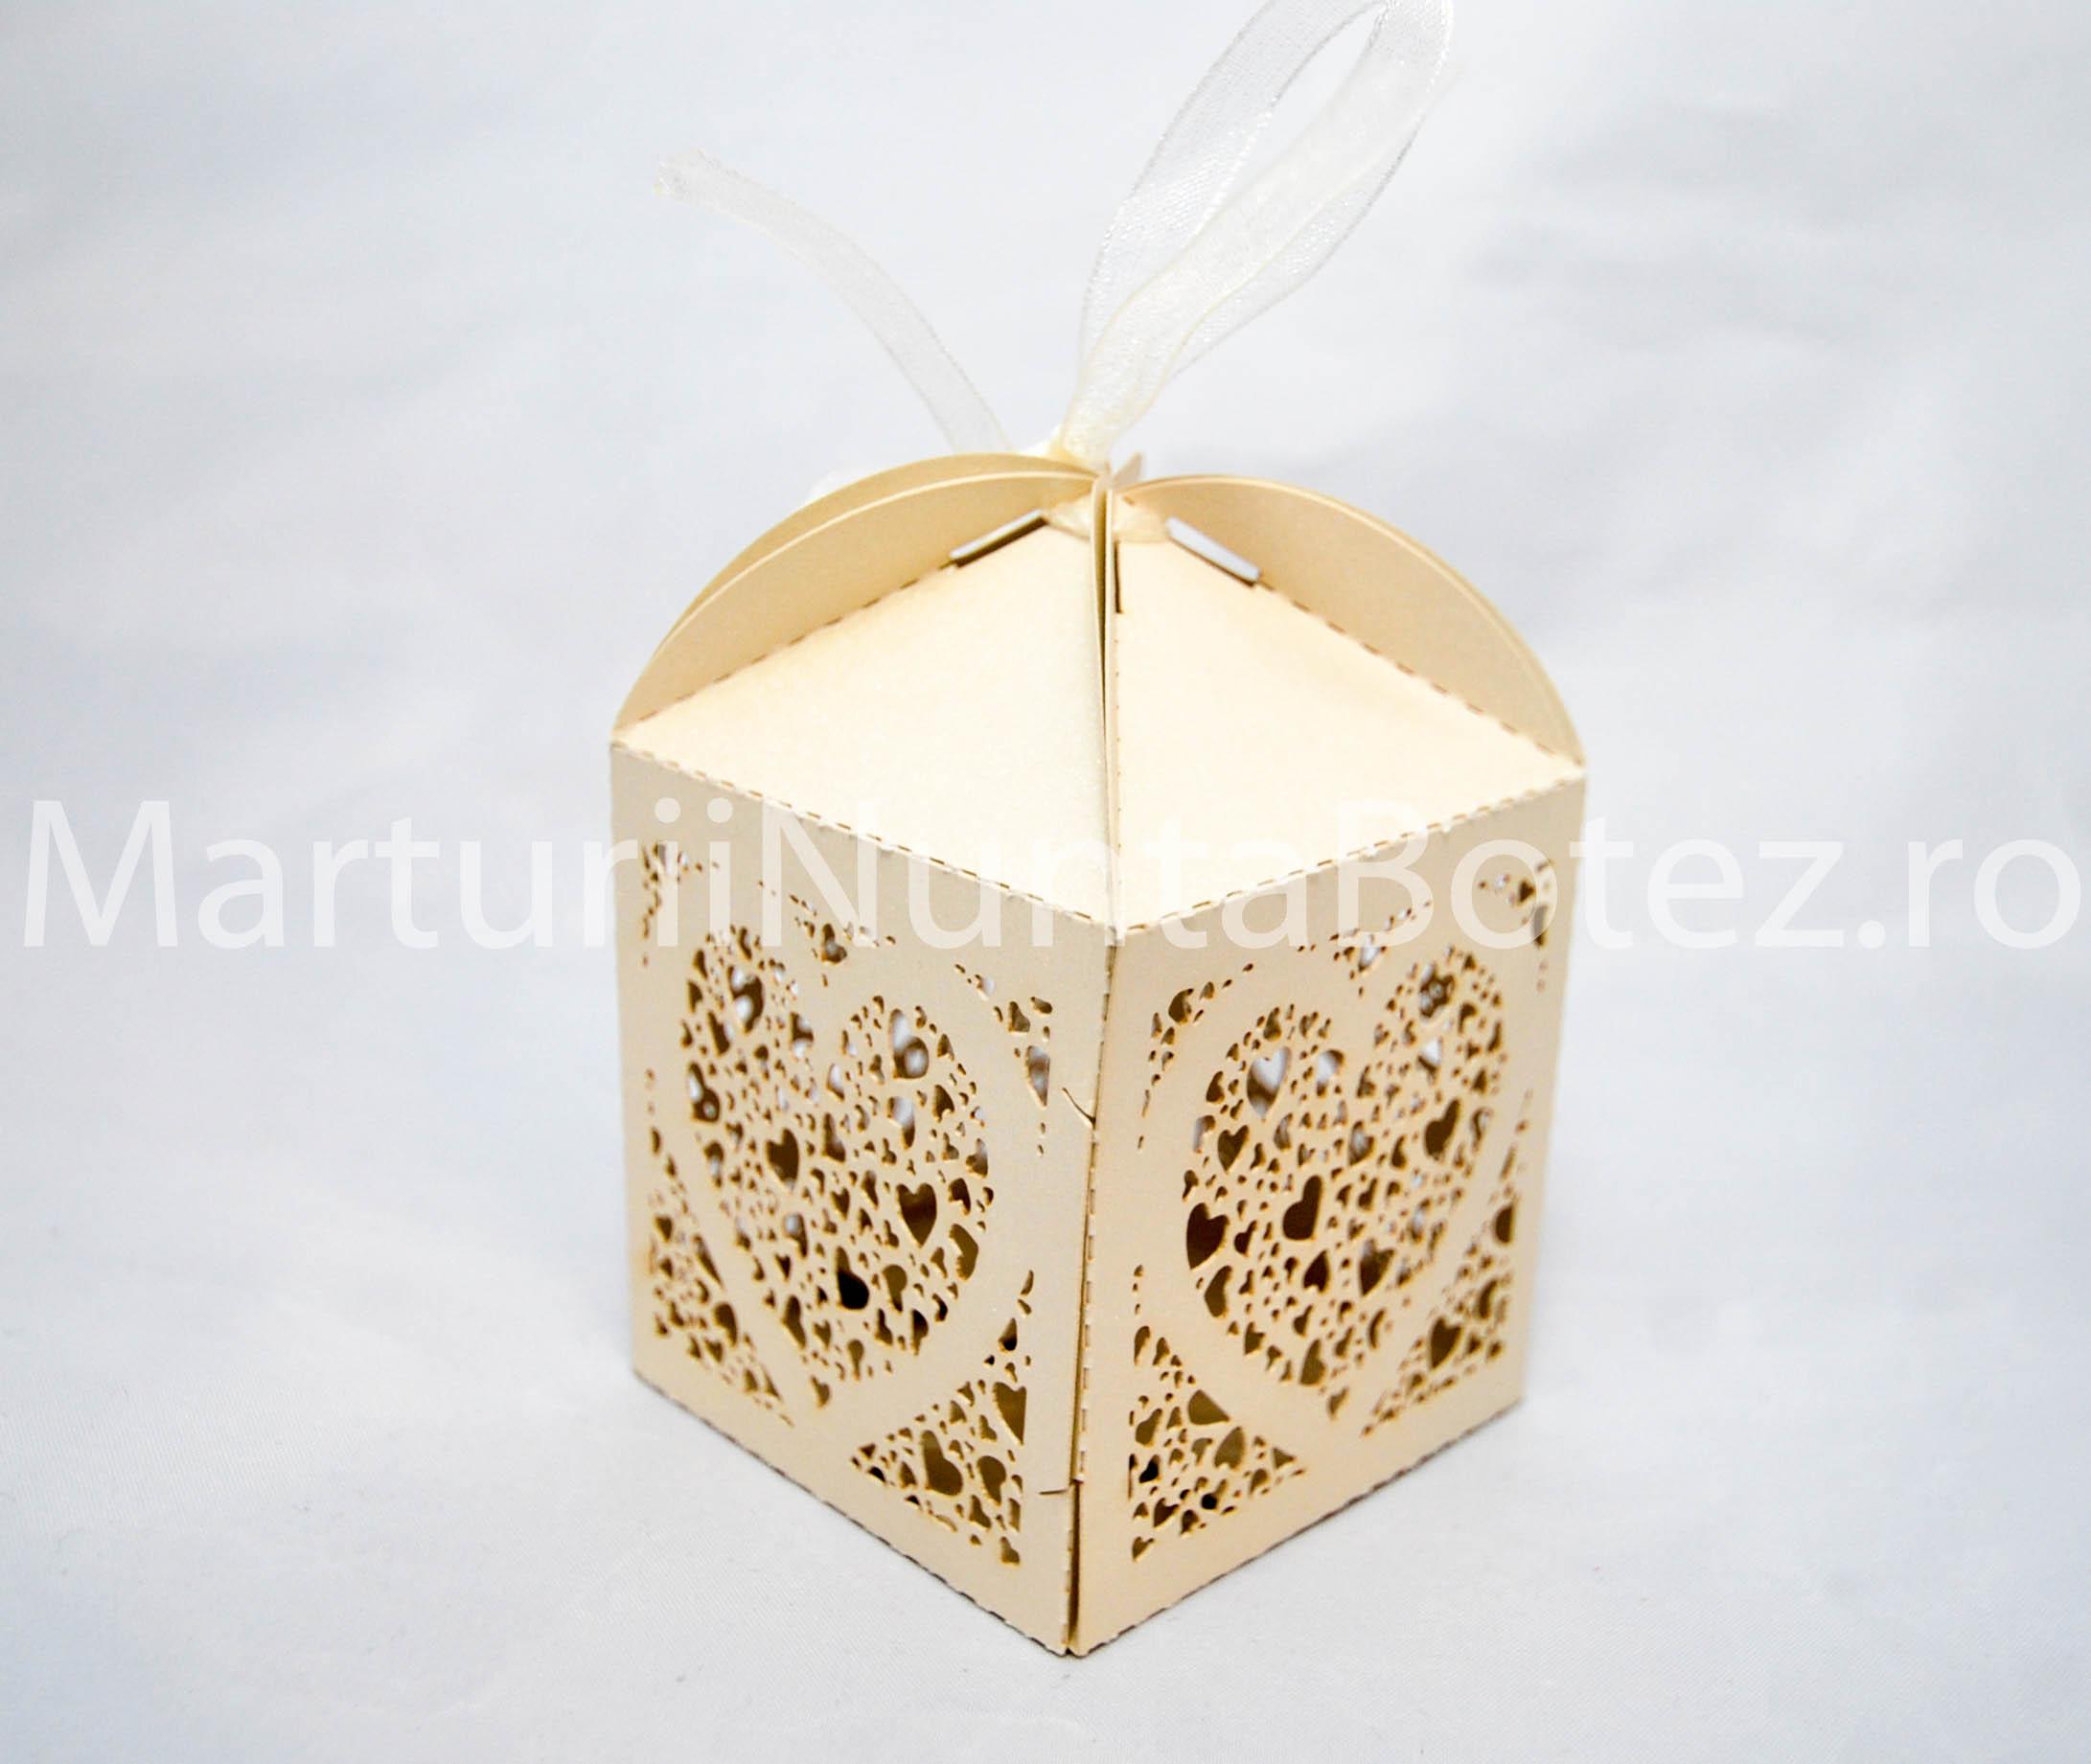 marturii_nunta_cutie_perforata_carton_model_inima_deosebita5